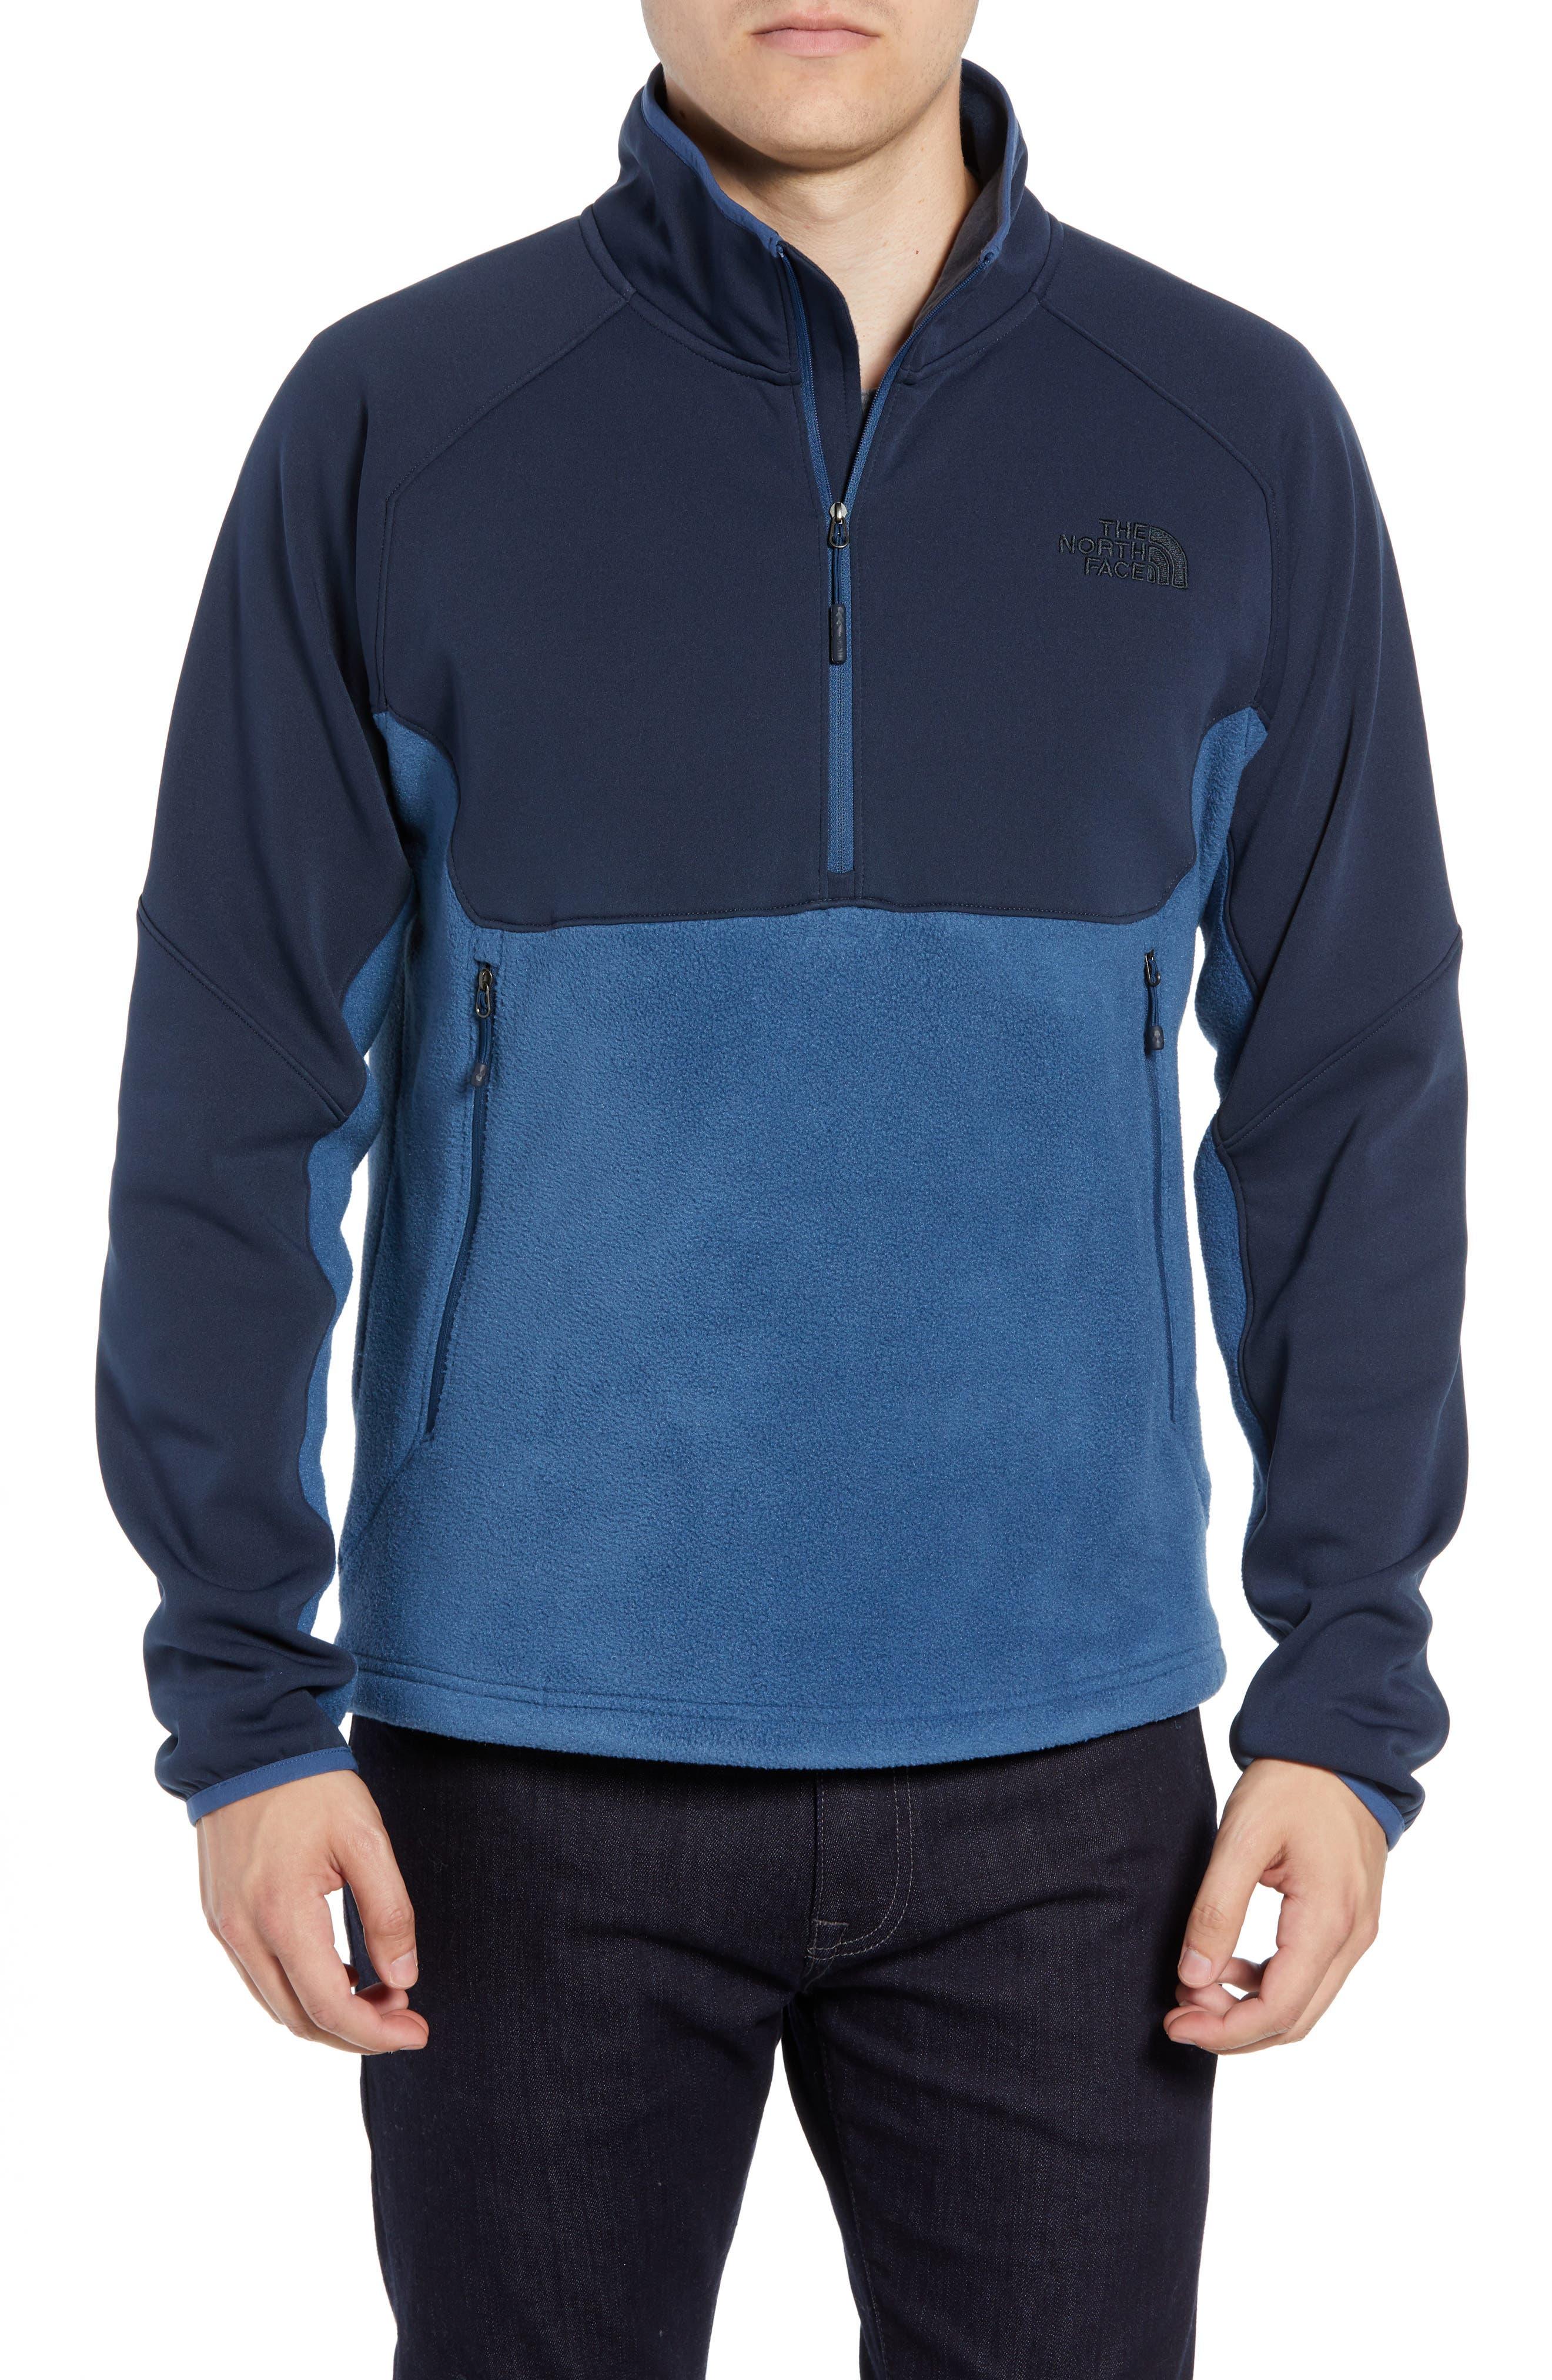 Tolmiepeak Hybrid Half-Zip Pullover,                         Main,                         color, SHADY BLUE/ URBAN NAVY